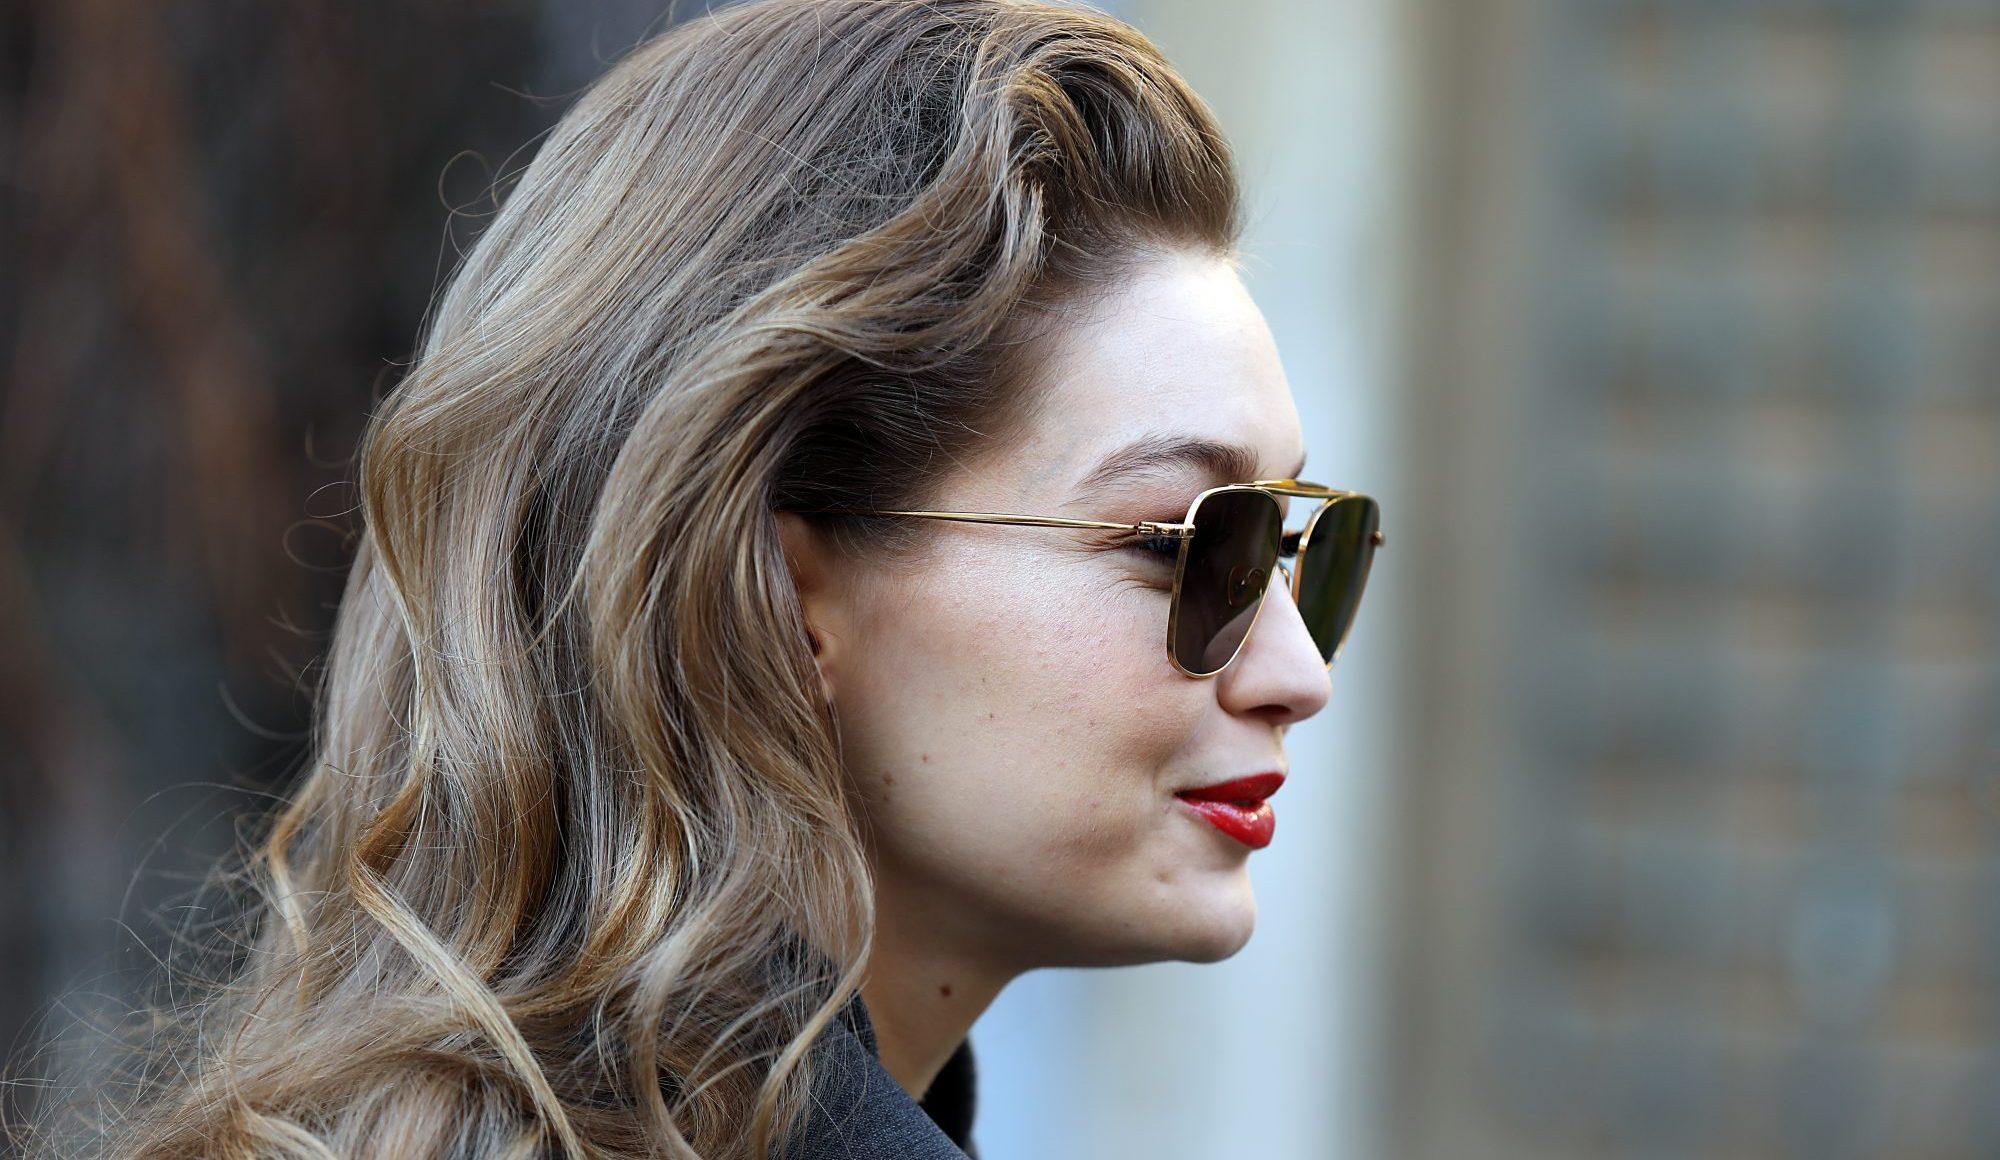 Gigi Hadid: Αυτή είναι η beauty routine της μετά την εγκυμοσύνη Το διάσημο topmodel μέσα από ένα tutorial video στα social media αποκαλύπτει ποιες είναι οι must κινήσεις αλλά και τα προϊόντα που δεν αποχωρίζεται στην περιποίησή της από την ημέρα που έγινε μαμά.